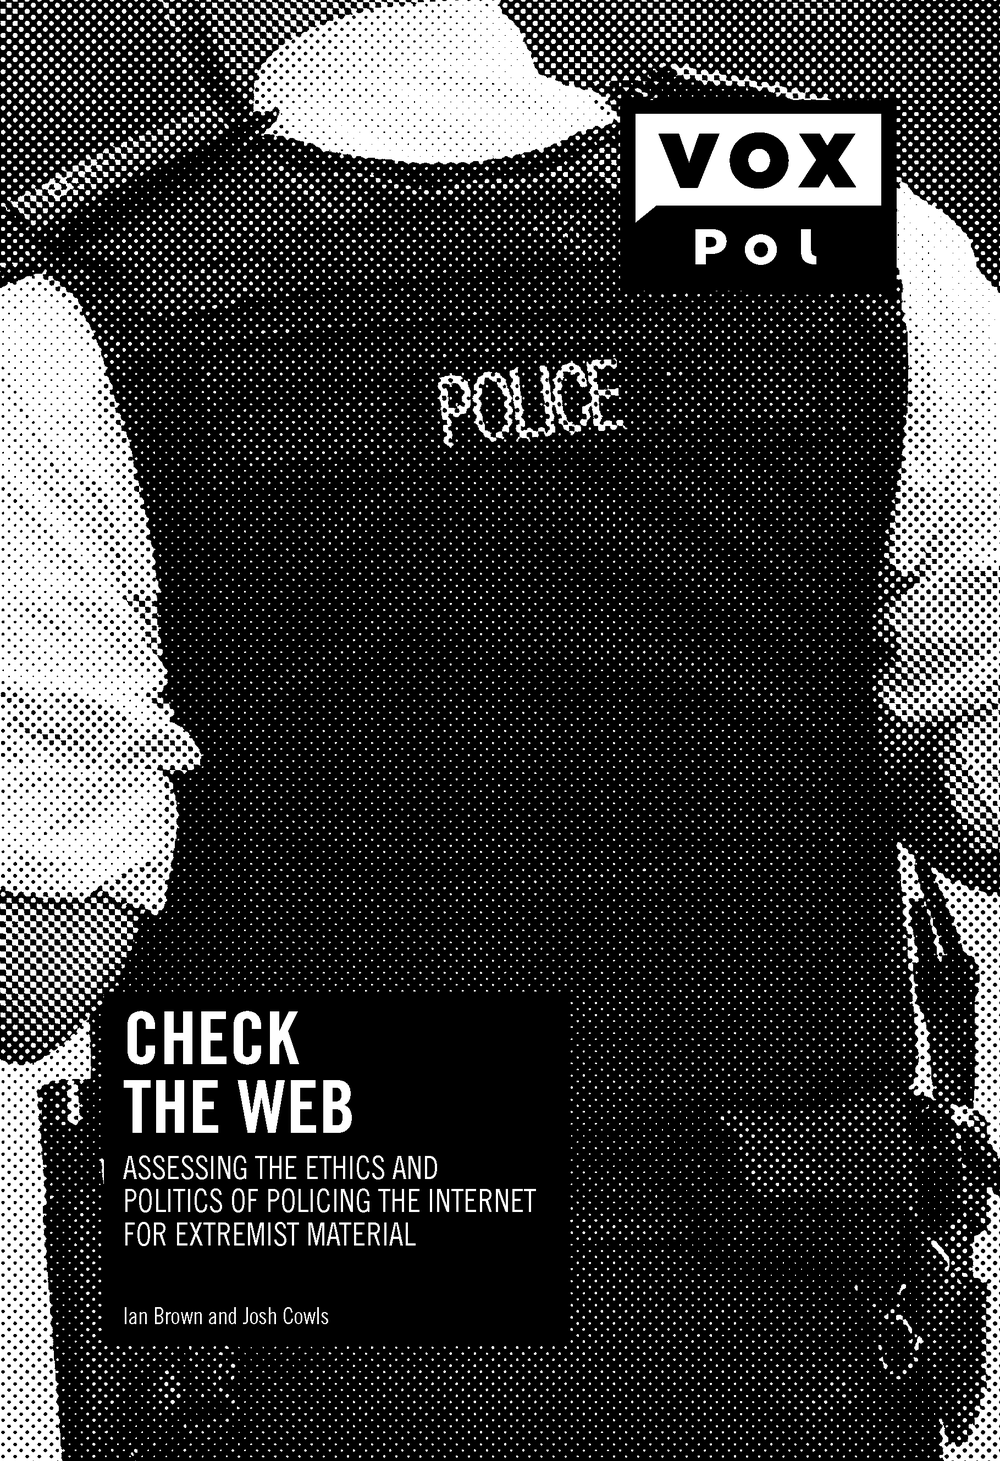 VOX-Pol_Ethics_Politics_PUBLISHED (1)_Page_001.png